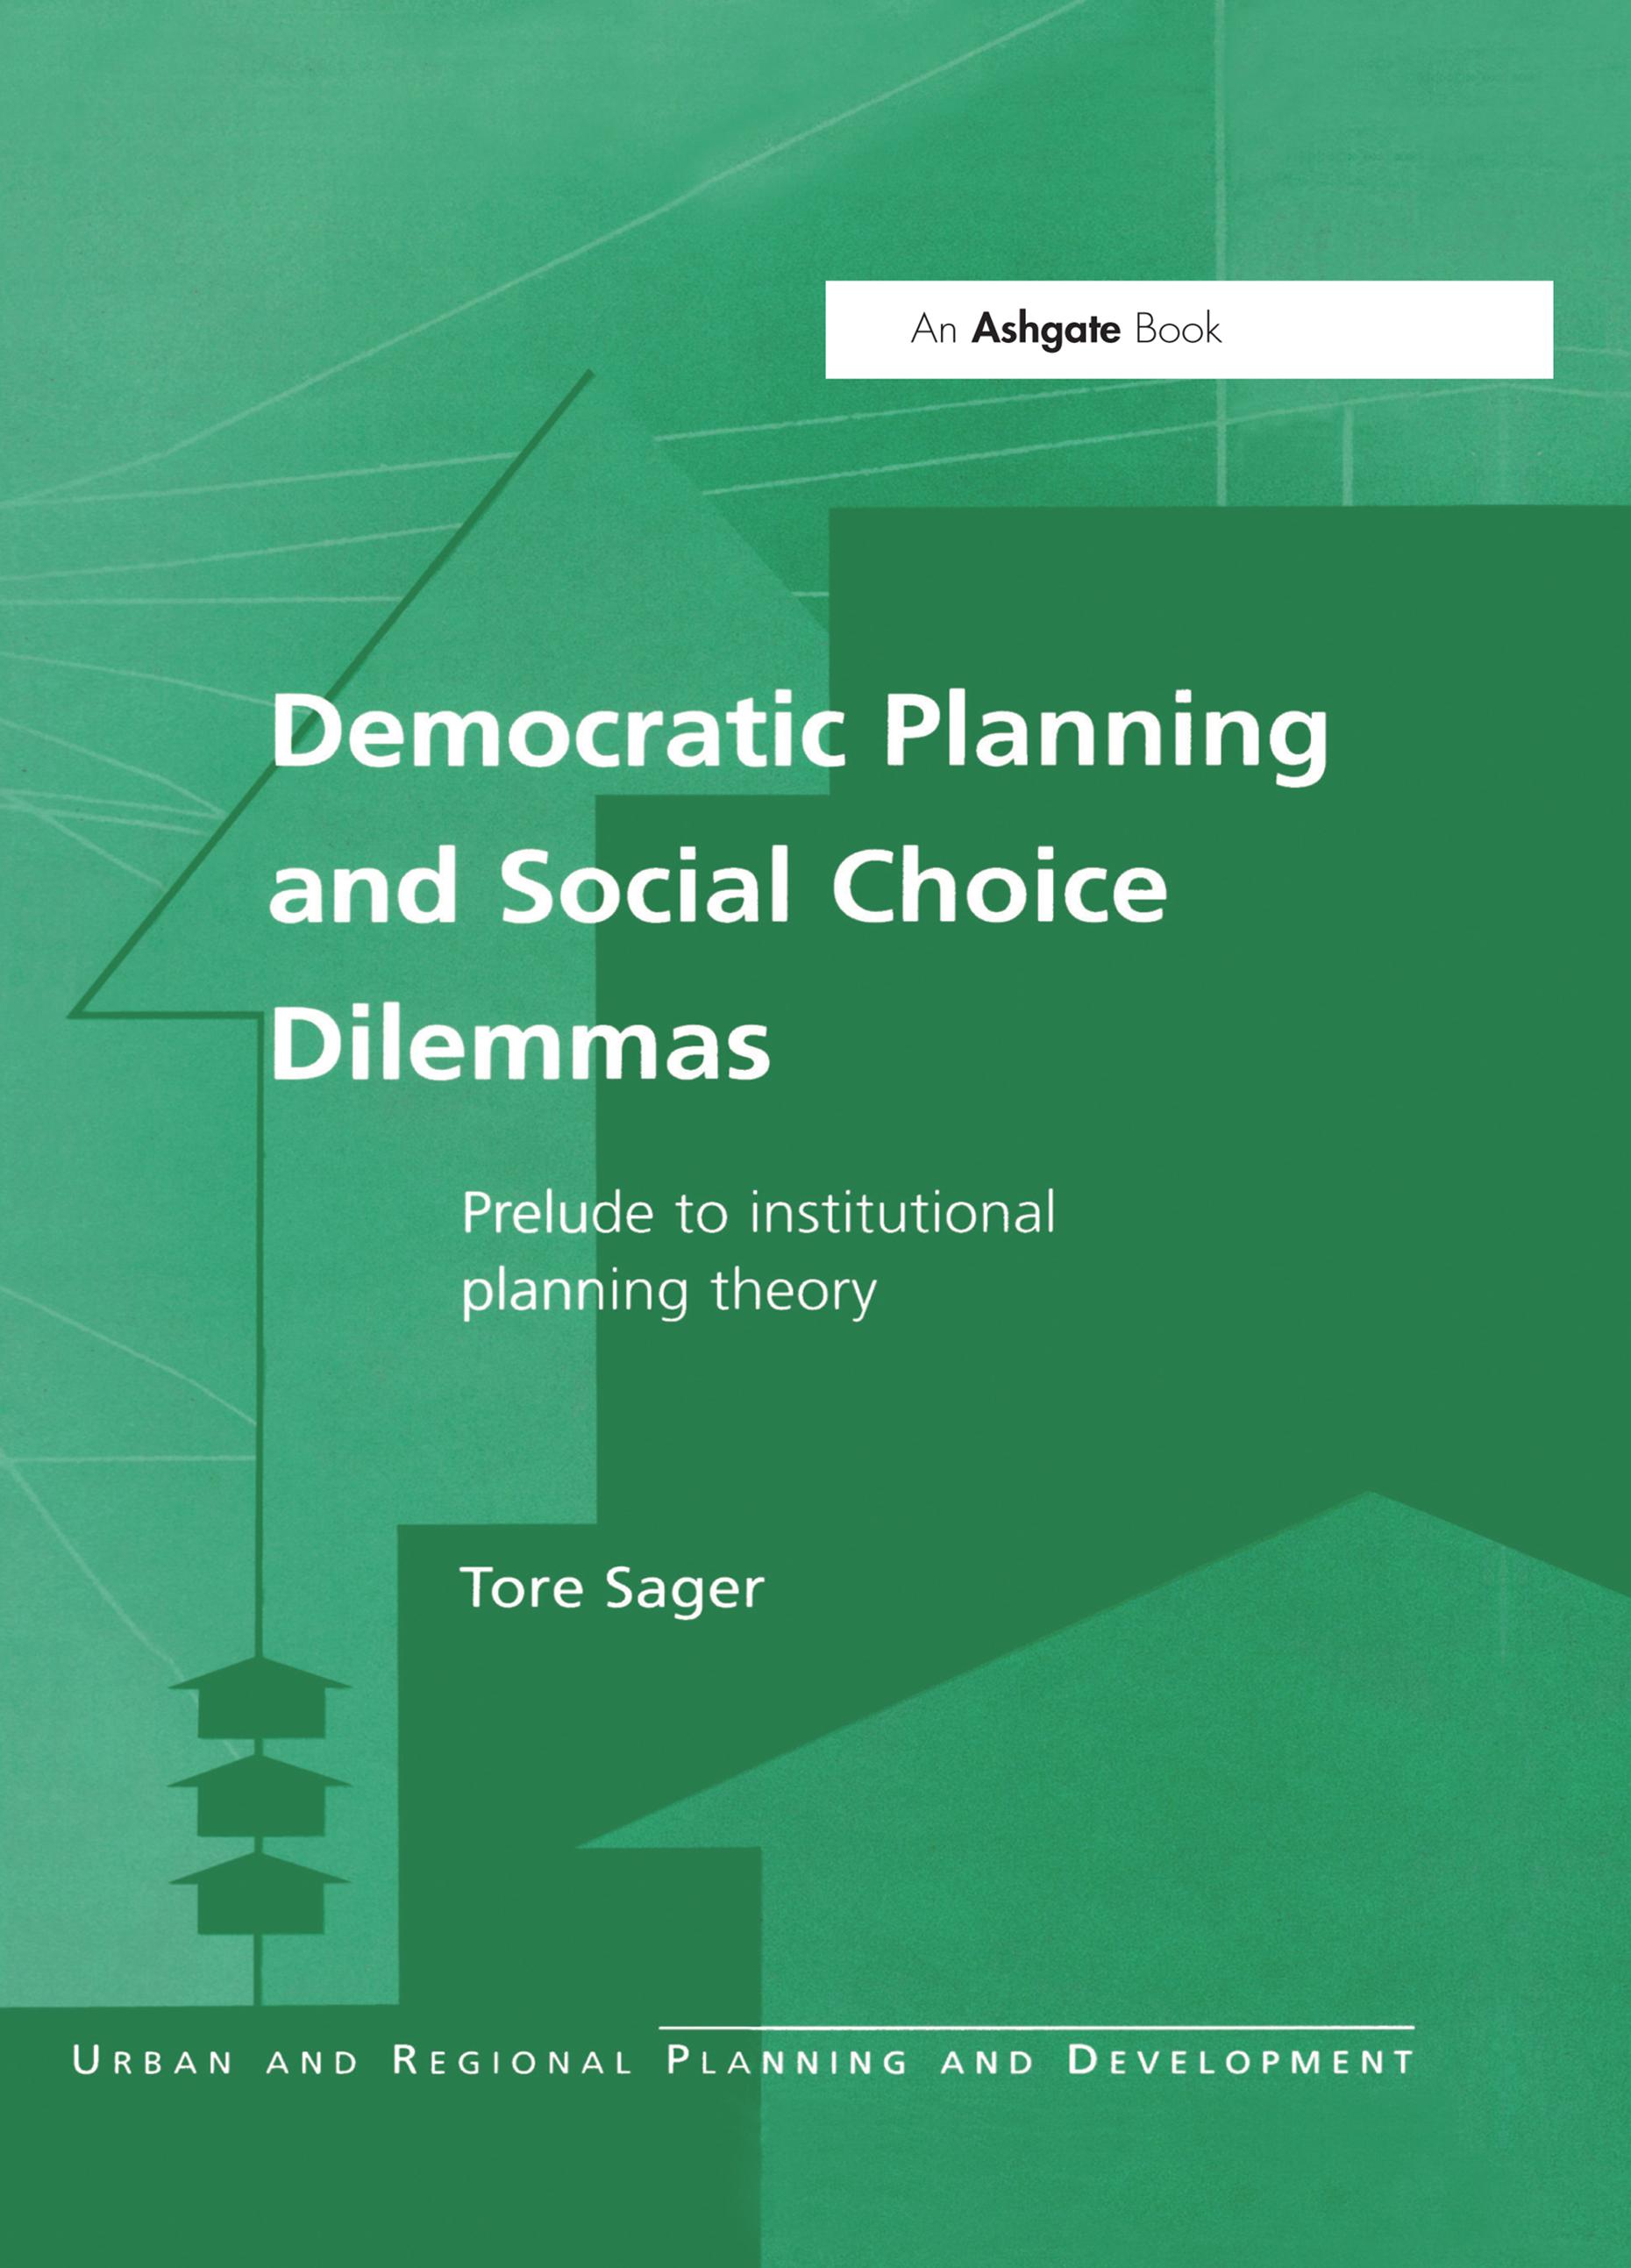 Democratic Planning and Social Choice Dilemmas